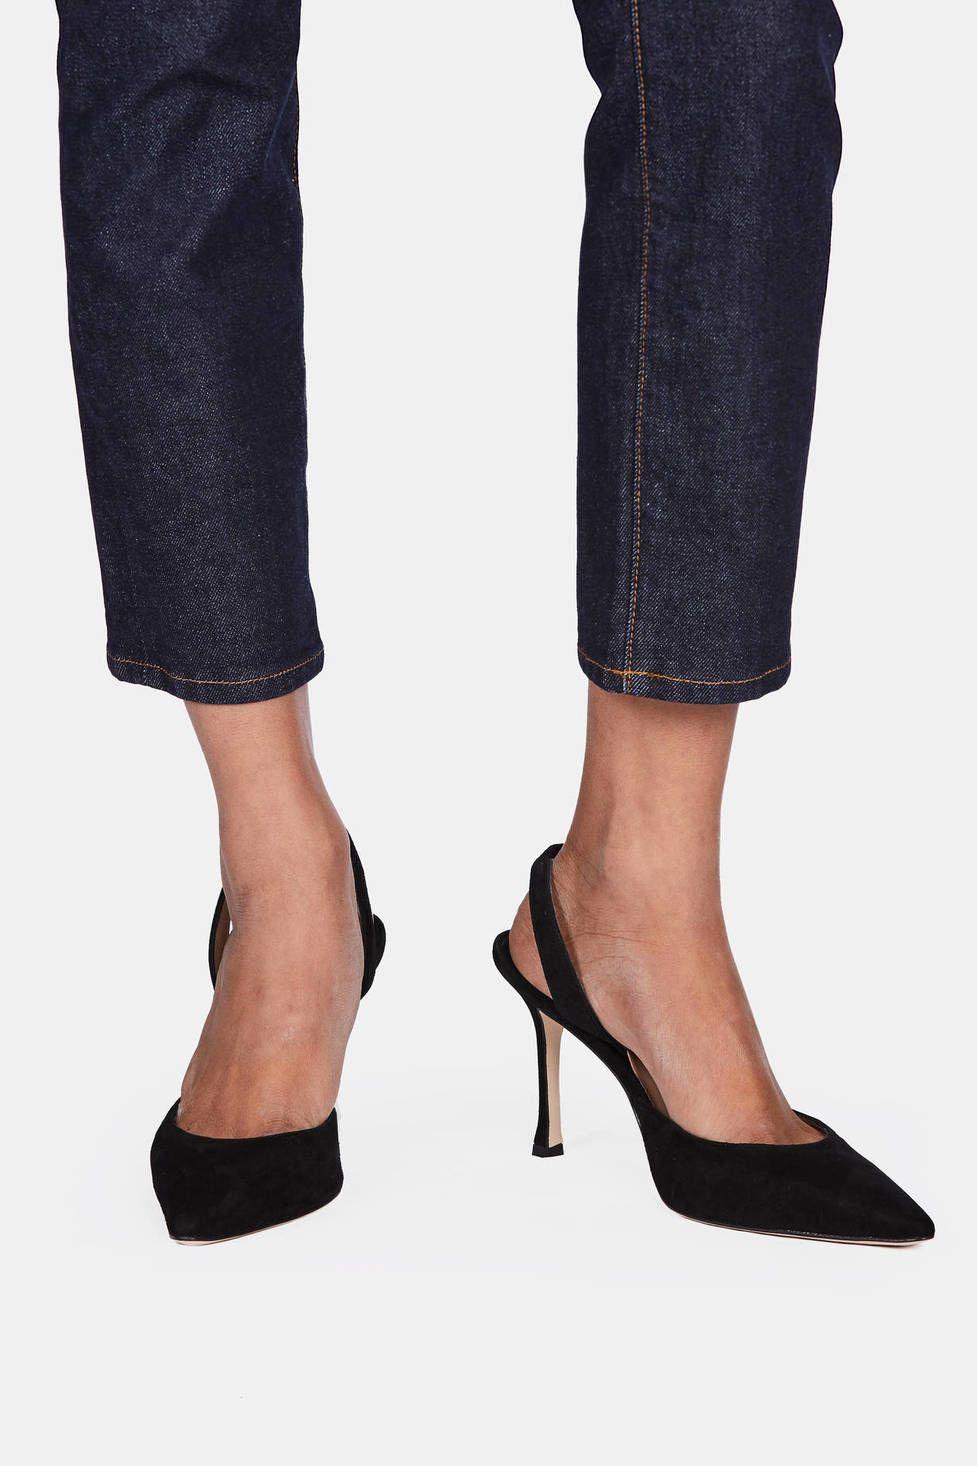 d68a501201 Carolyne Slingback - Black Suede   Shoe craving   Manolo blahnik ...